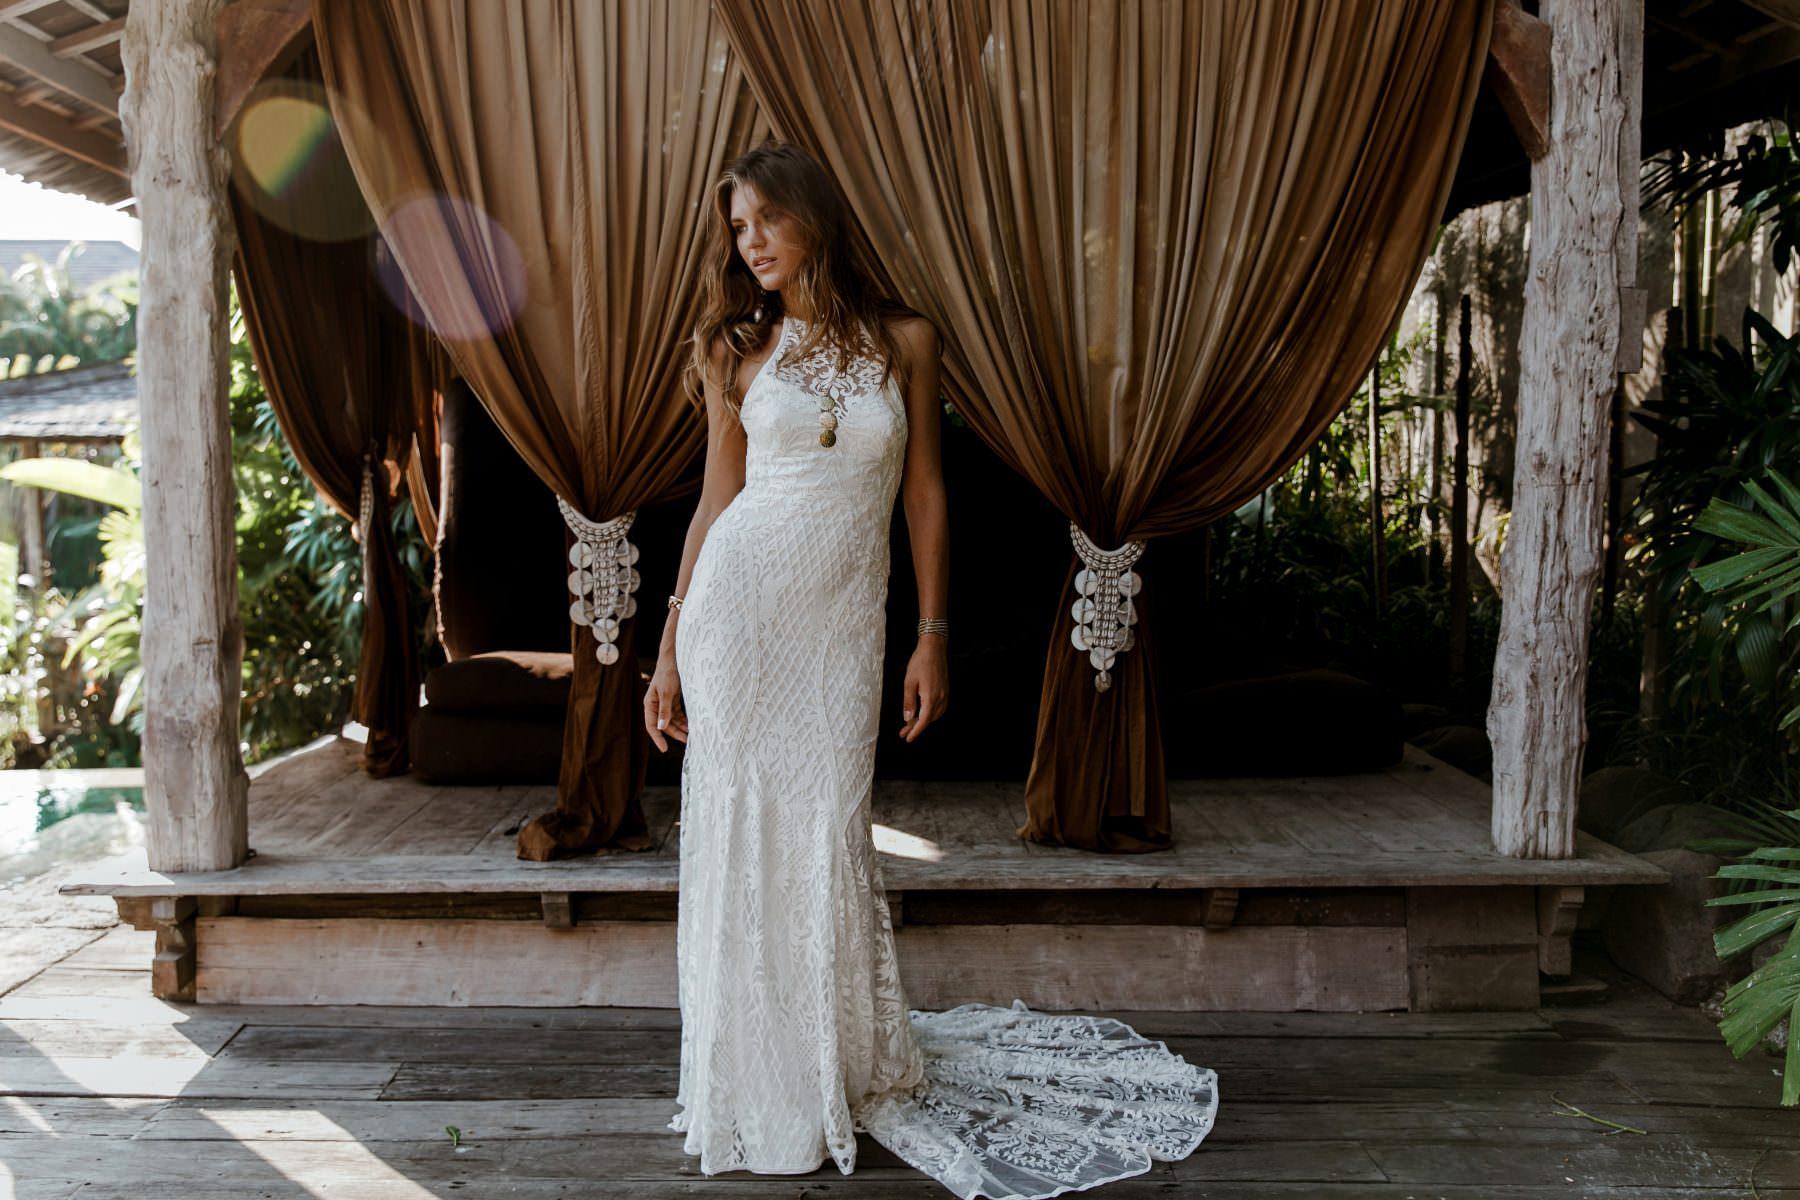 Reef lovers society wedding dresses Wedding Dress wedding dresses bridal shop store gowns christchurch wellington